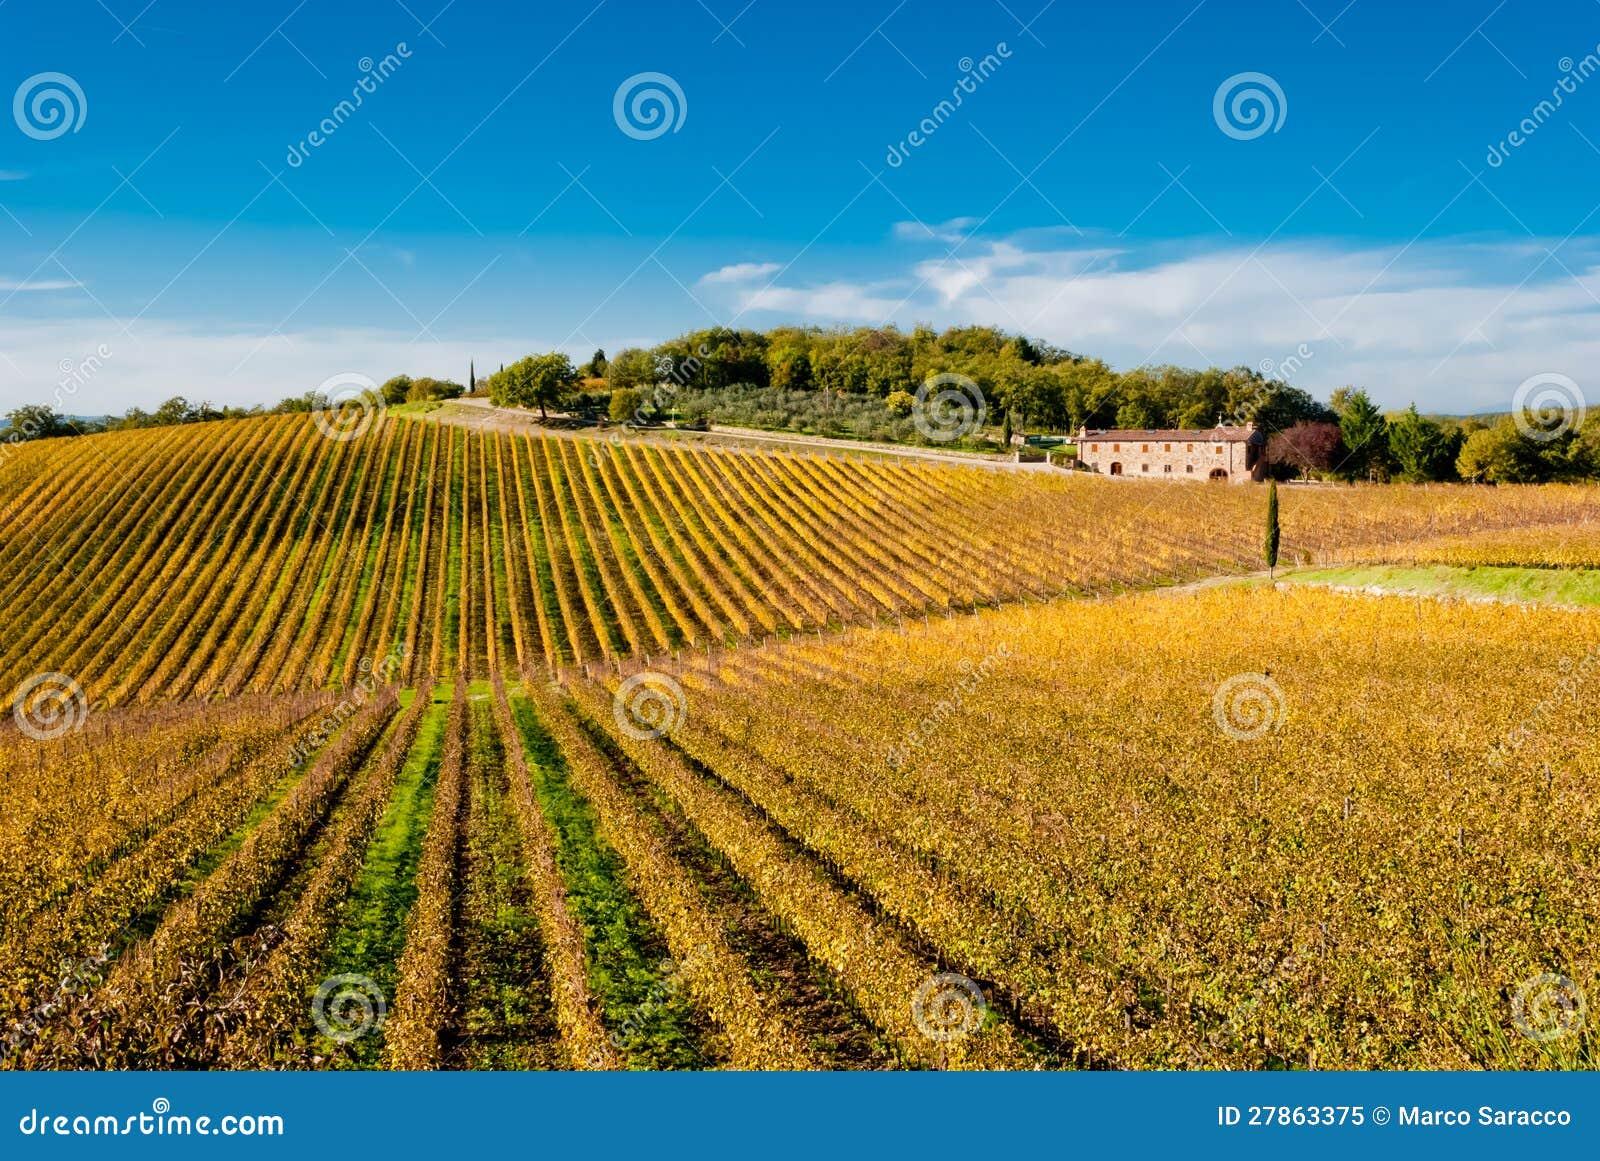 Chianti wine region vineyards, Tuscany